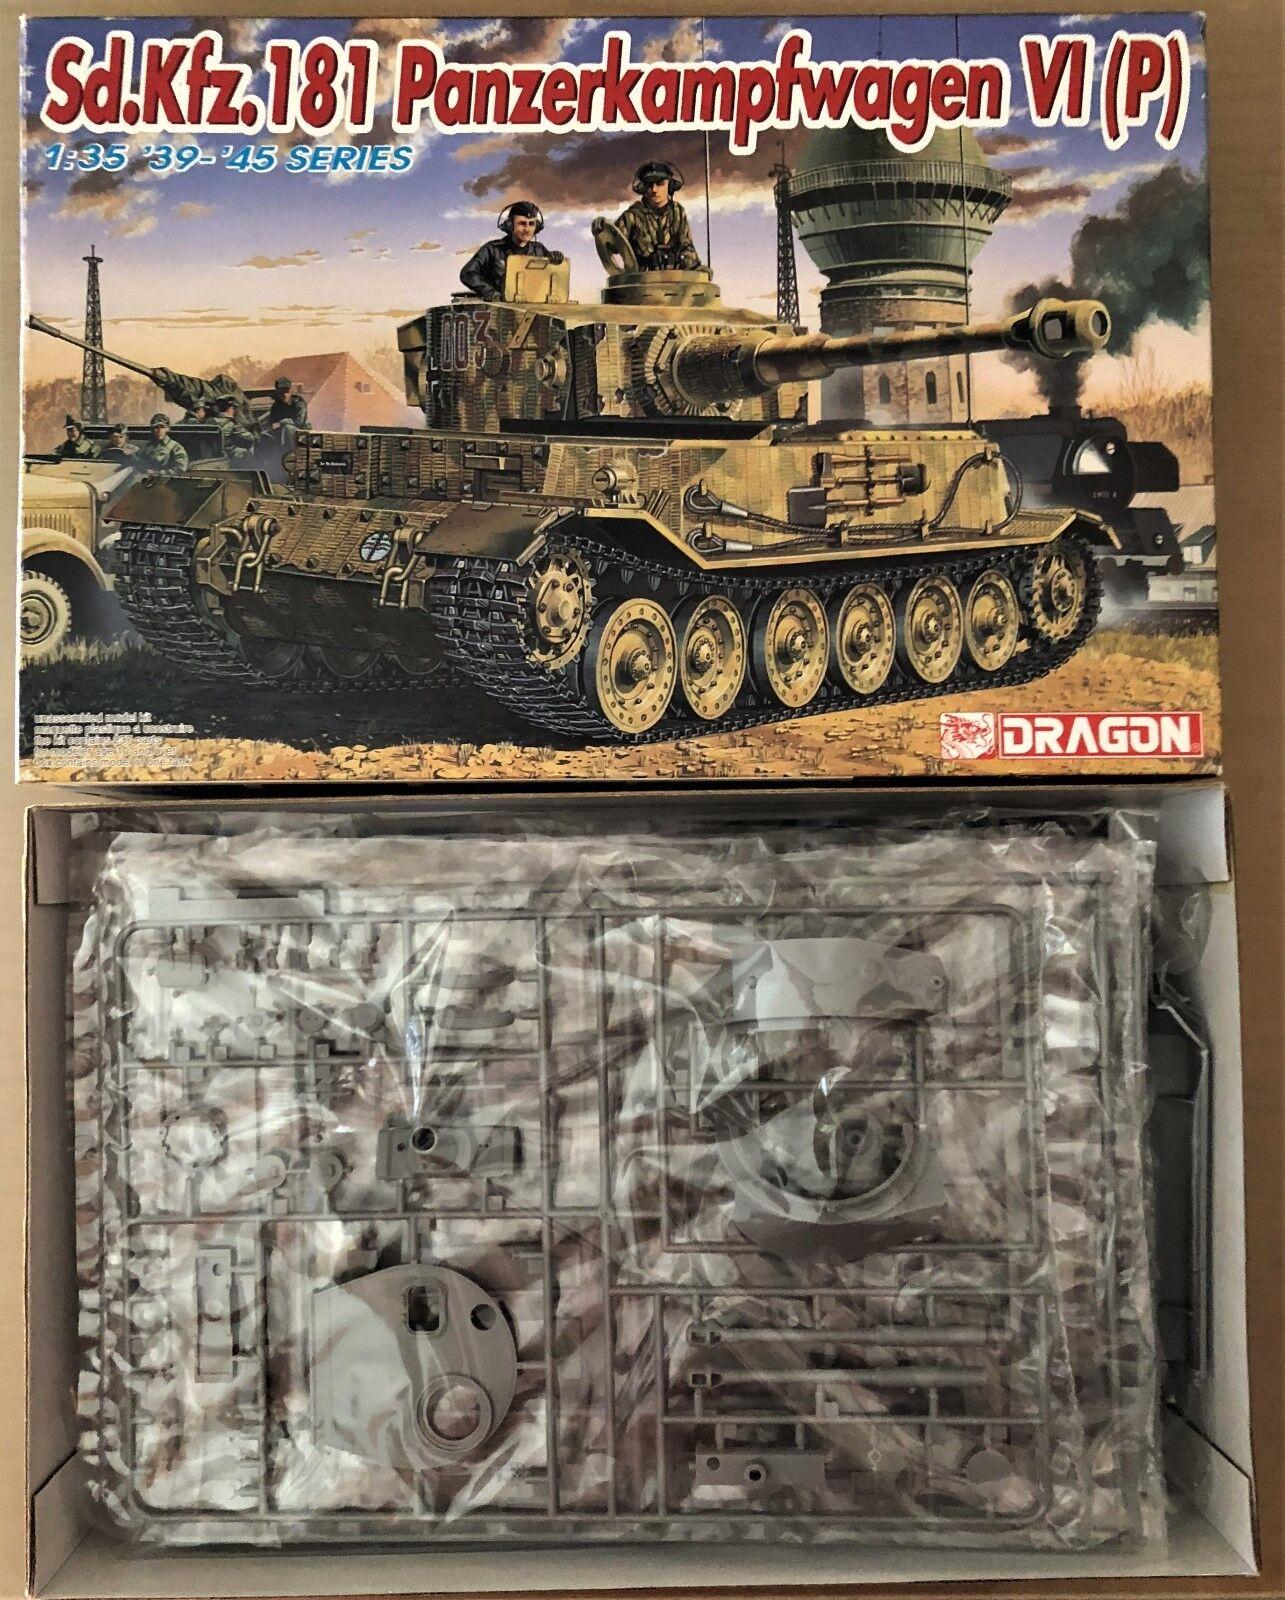 Dragon 6210-sd.kfz.181 Panzerkampfwagen VI (P) - 1 35 Plastic Kit